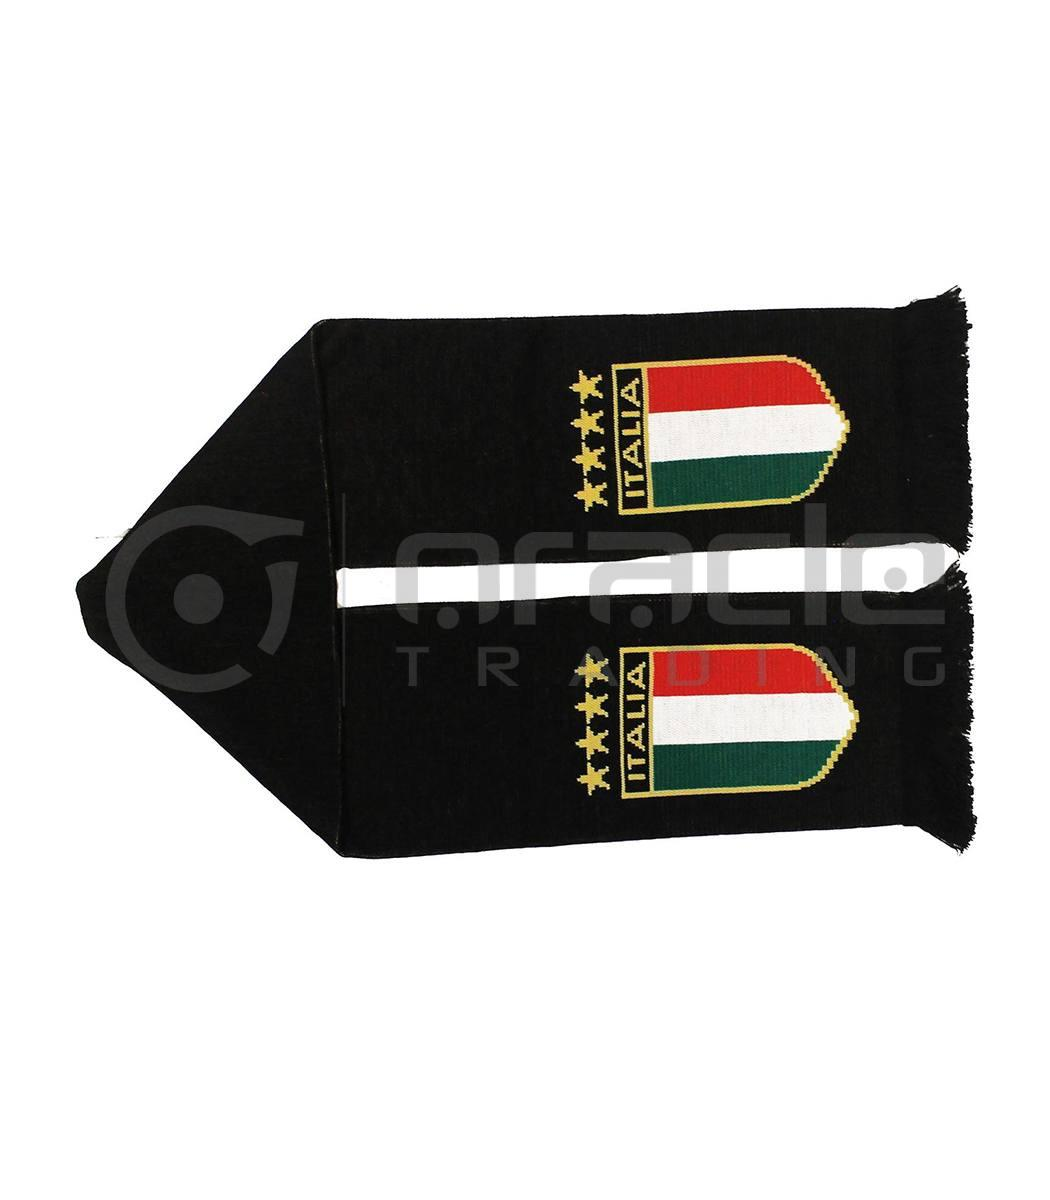 Italia Black Edition UK-Made Scarf